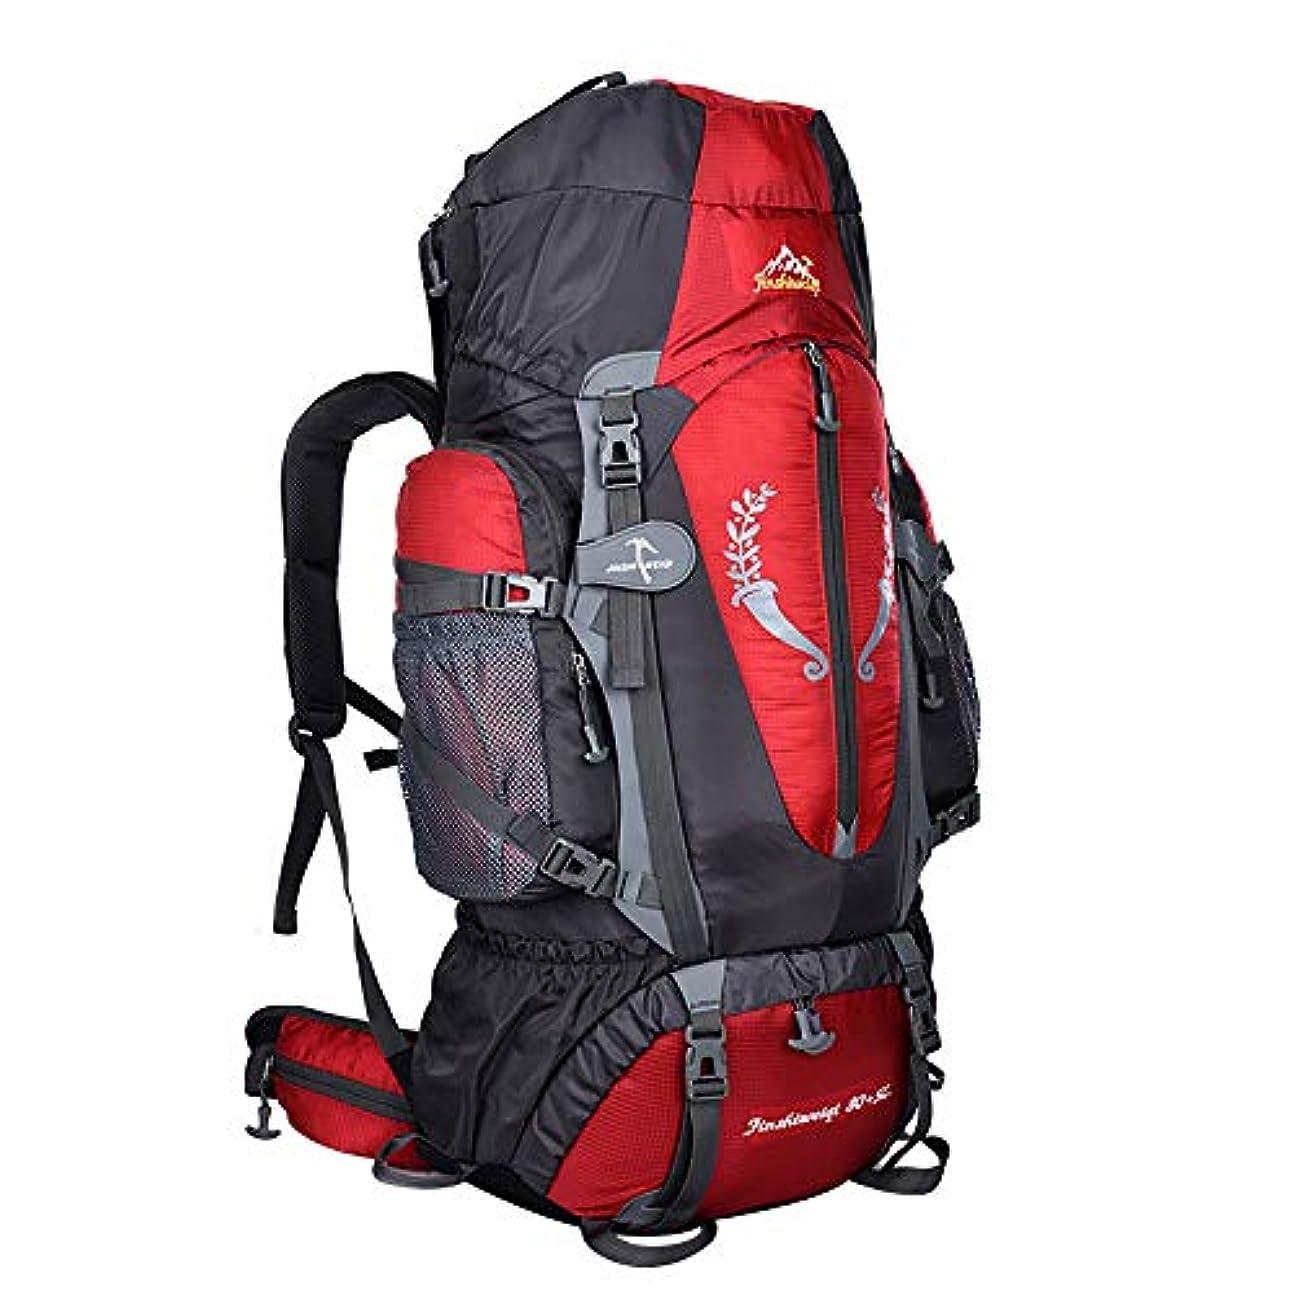 85L 登山リュックマウンテンデイパック YOKINO 大型旅行バッグ 拡張可能 超大容量 広口開口仕様 防水耐震 タクティカル アルパインパック リュックサック キャンプ トレッキング 旅行 アウトドア